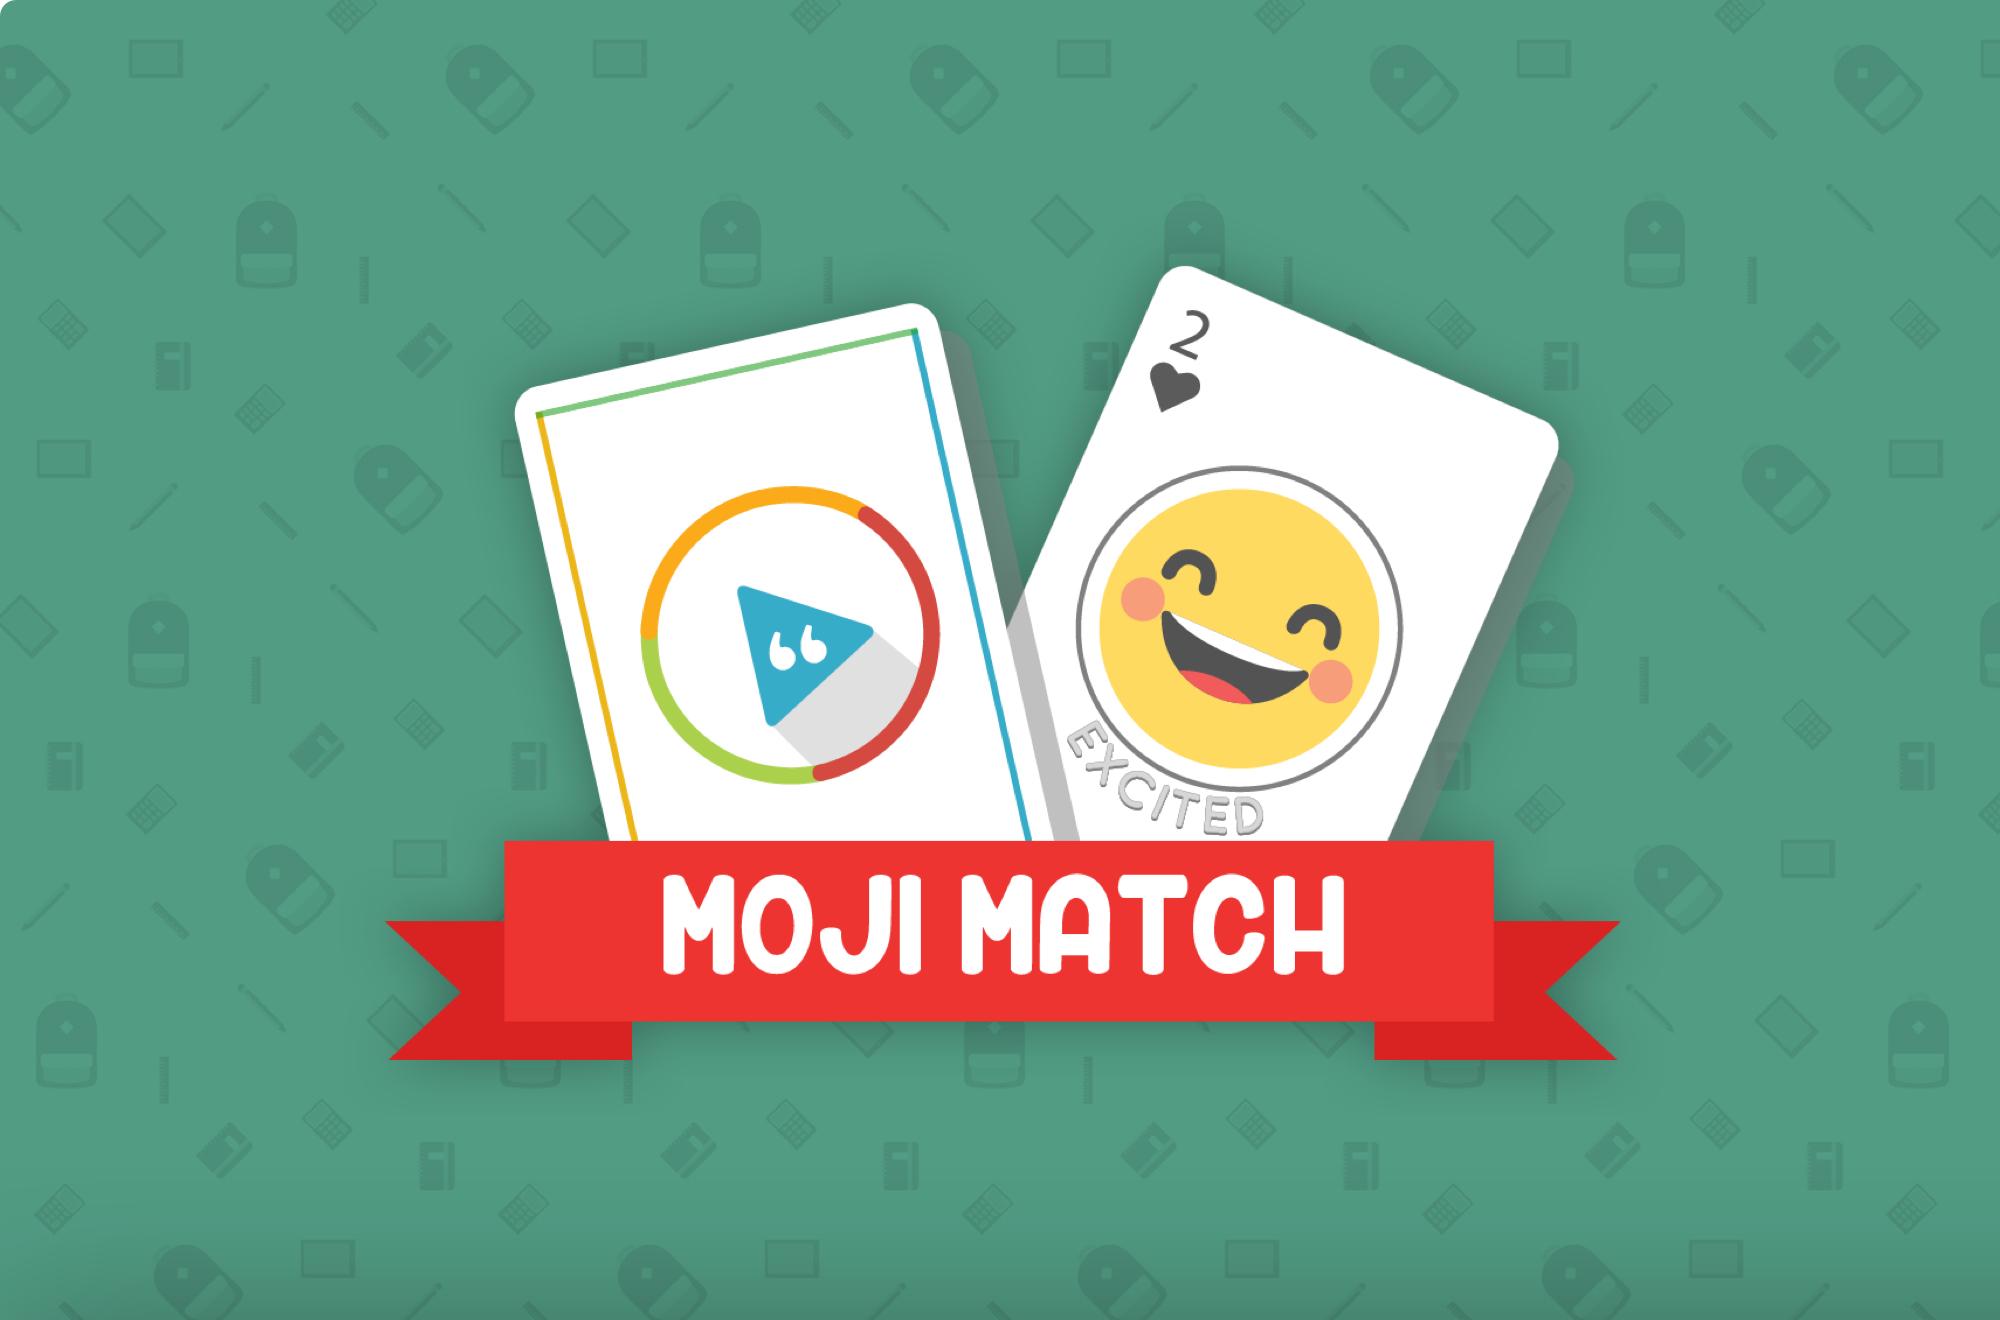 Moji Match